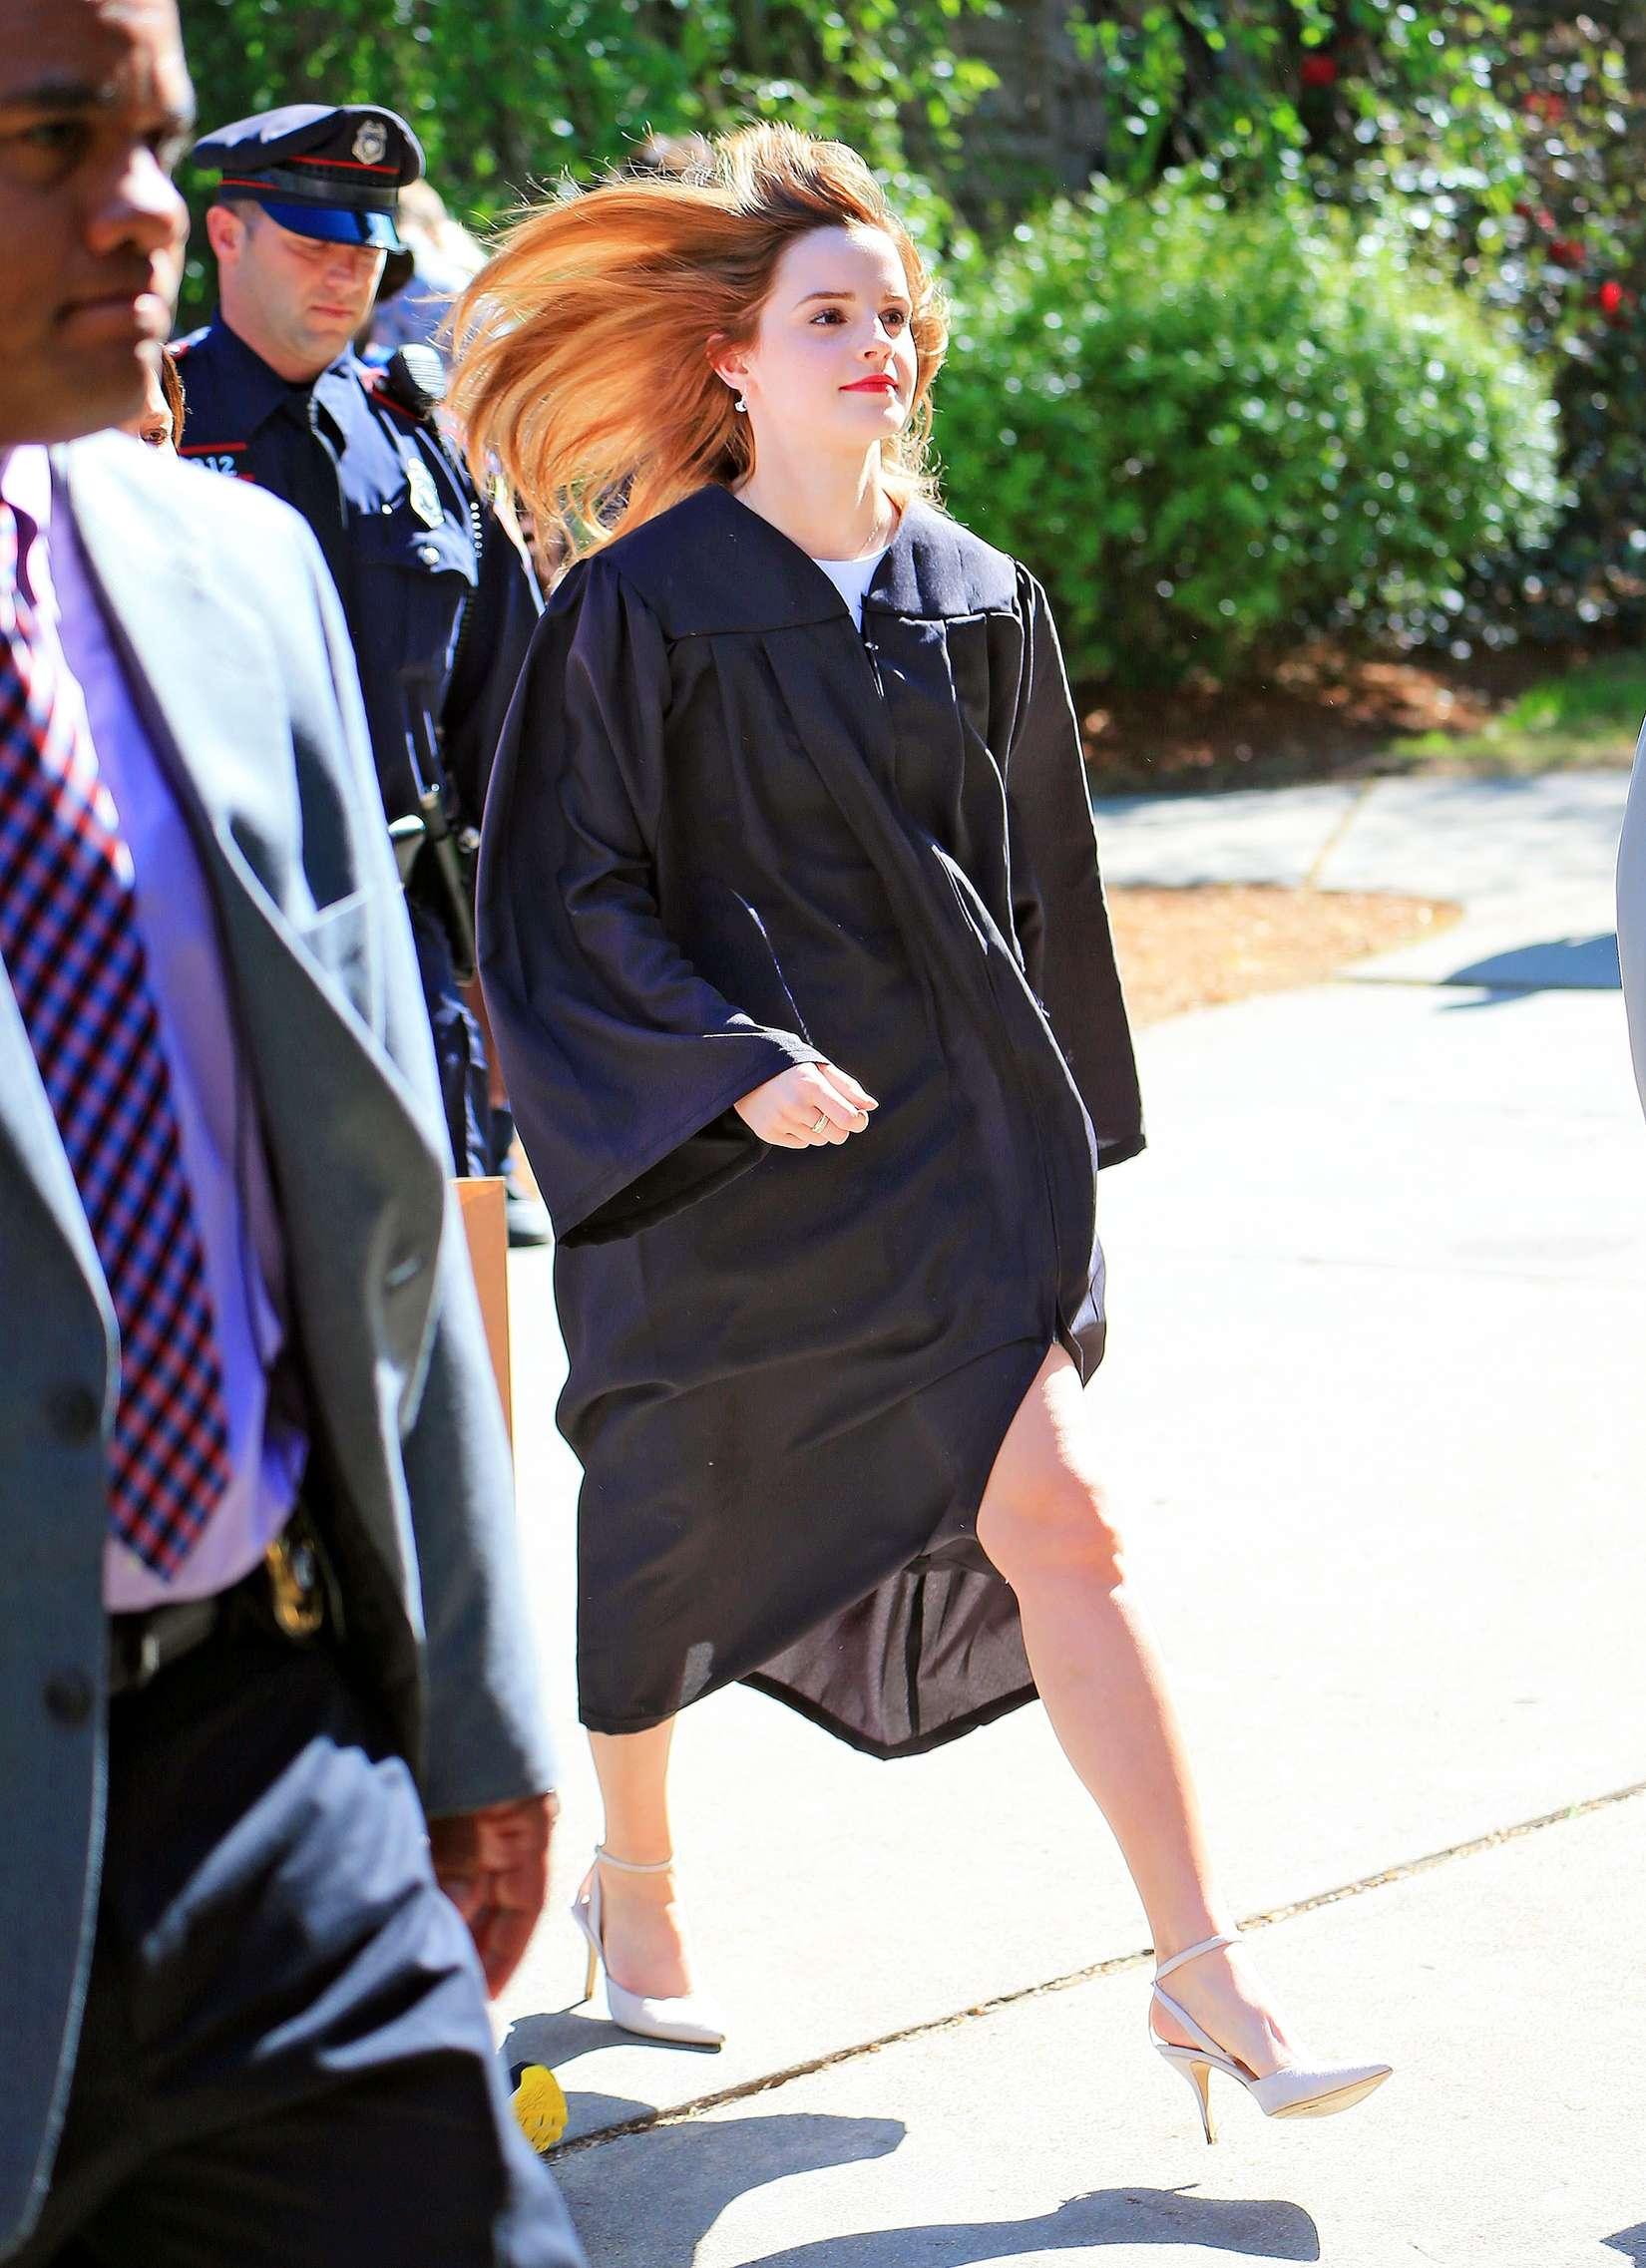 Graduation Quotes, Commencement Sayings, Advice for Graduates